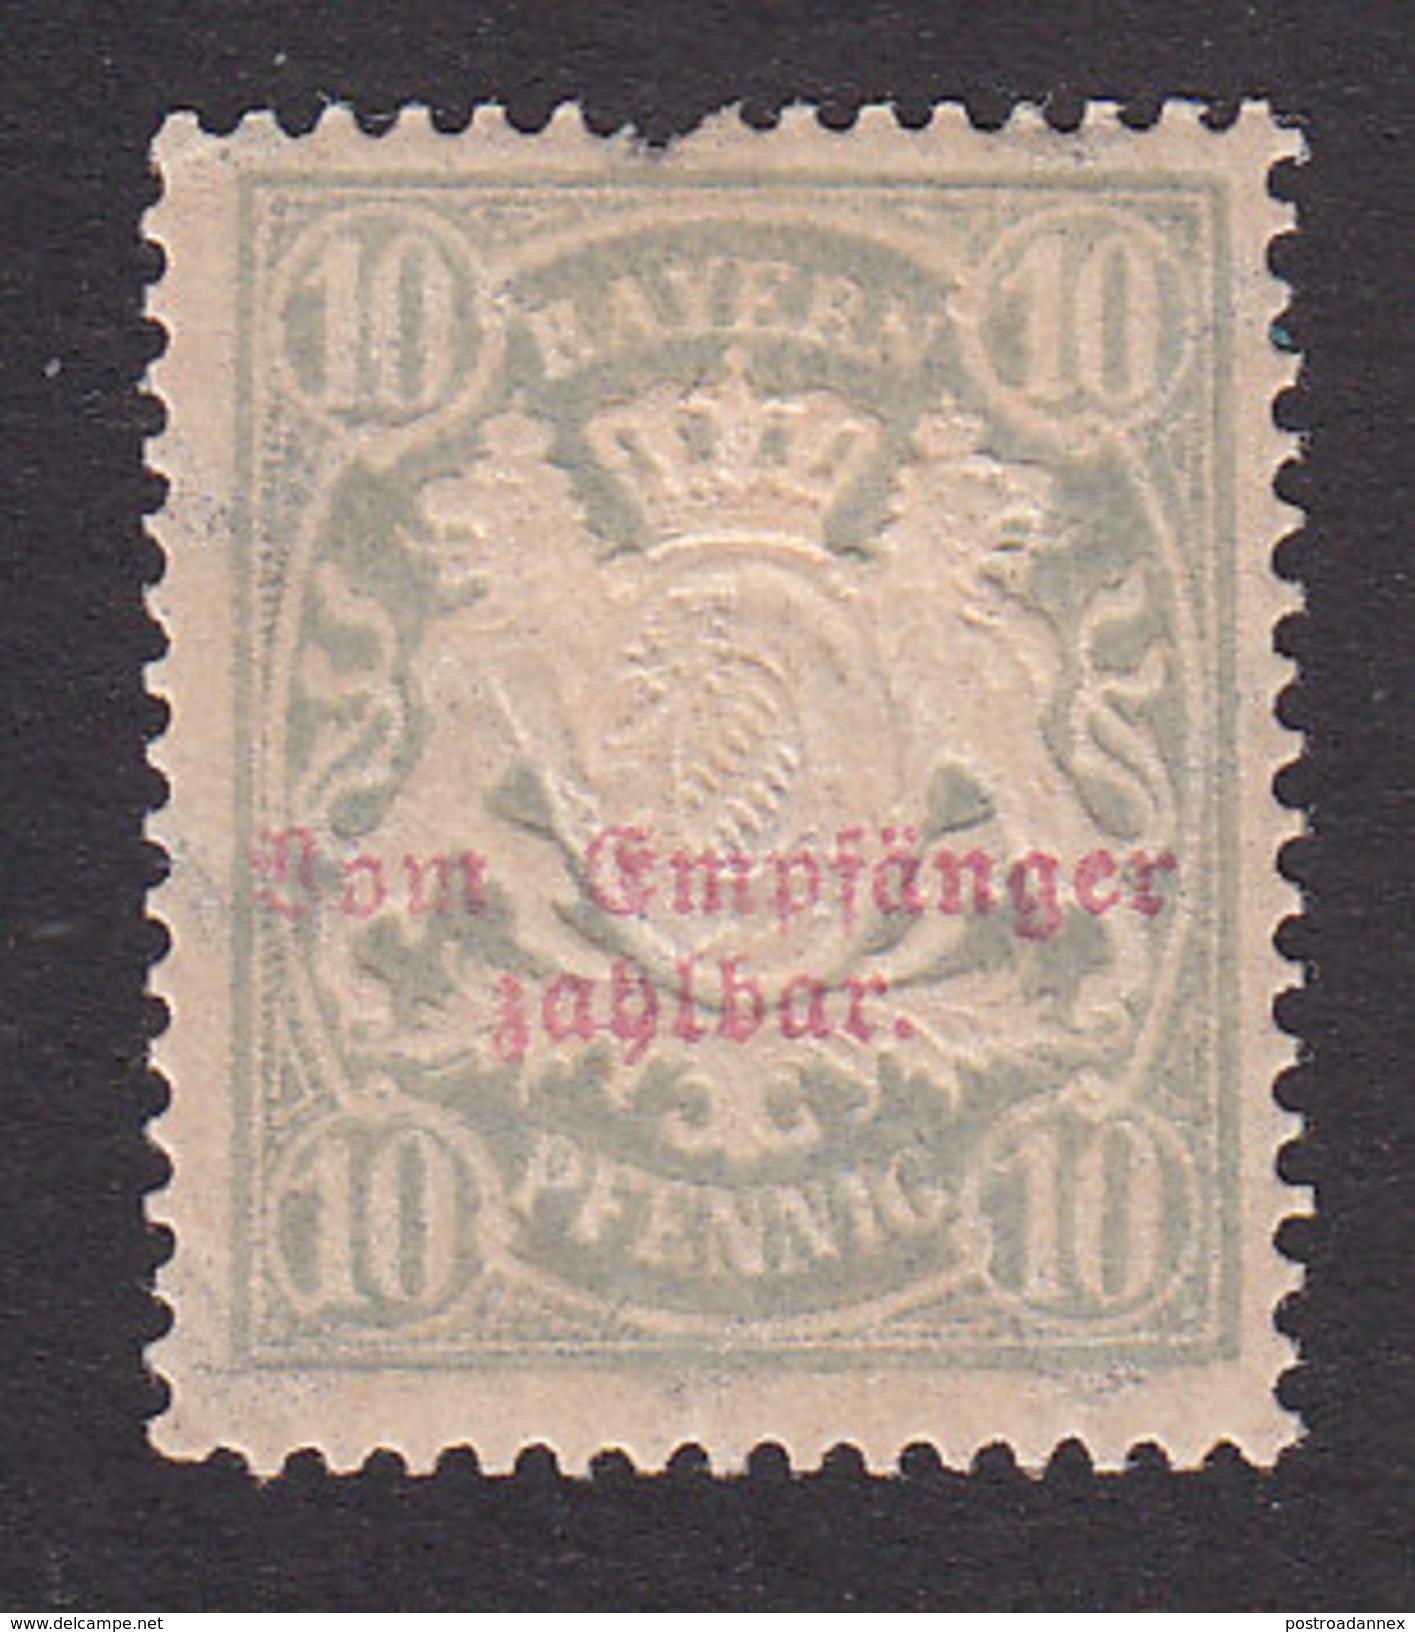 Bavaria, Scott #J13a, Mint Hinged, Coat Of Arms Overprinted, Issued 1895 - Bavaria